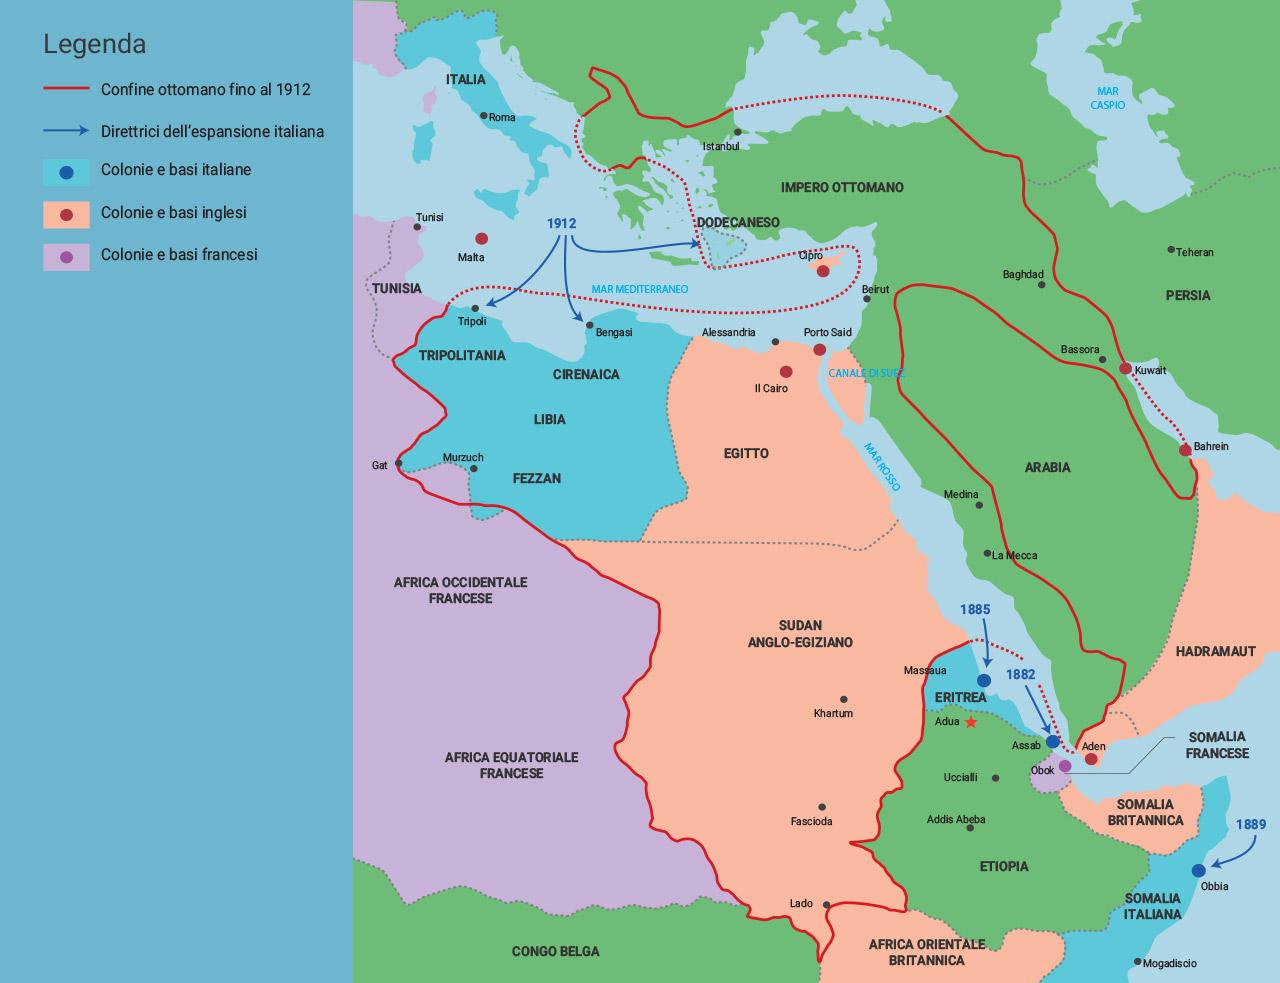 Cartina Politica Africa In Italiano.Mondadori Education